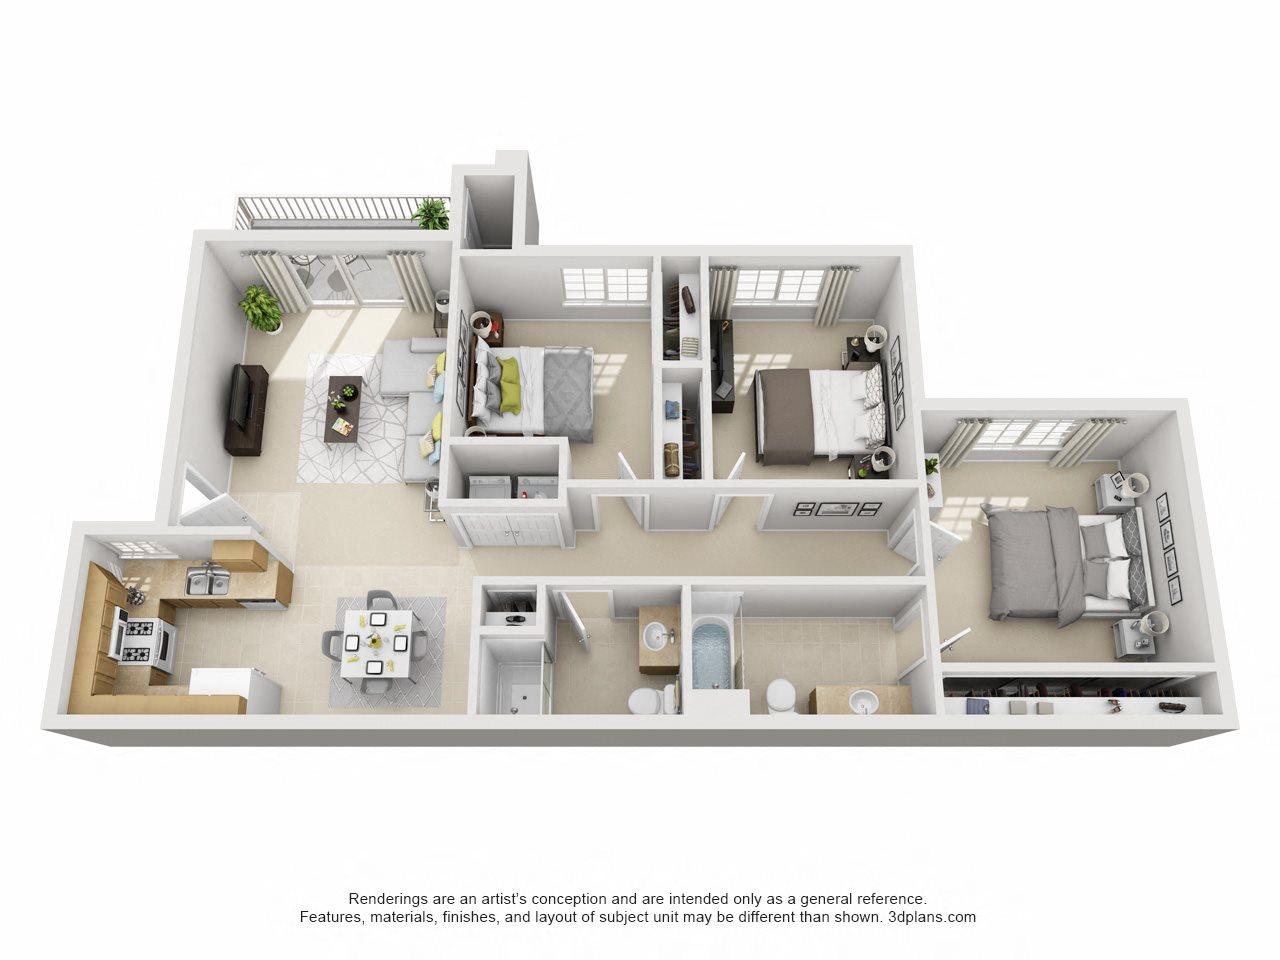 3 Bedroom, 2 Bath Downstairs Floor Plan 7